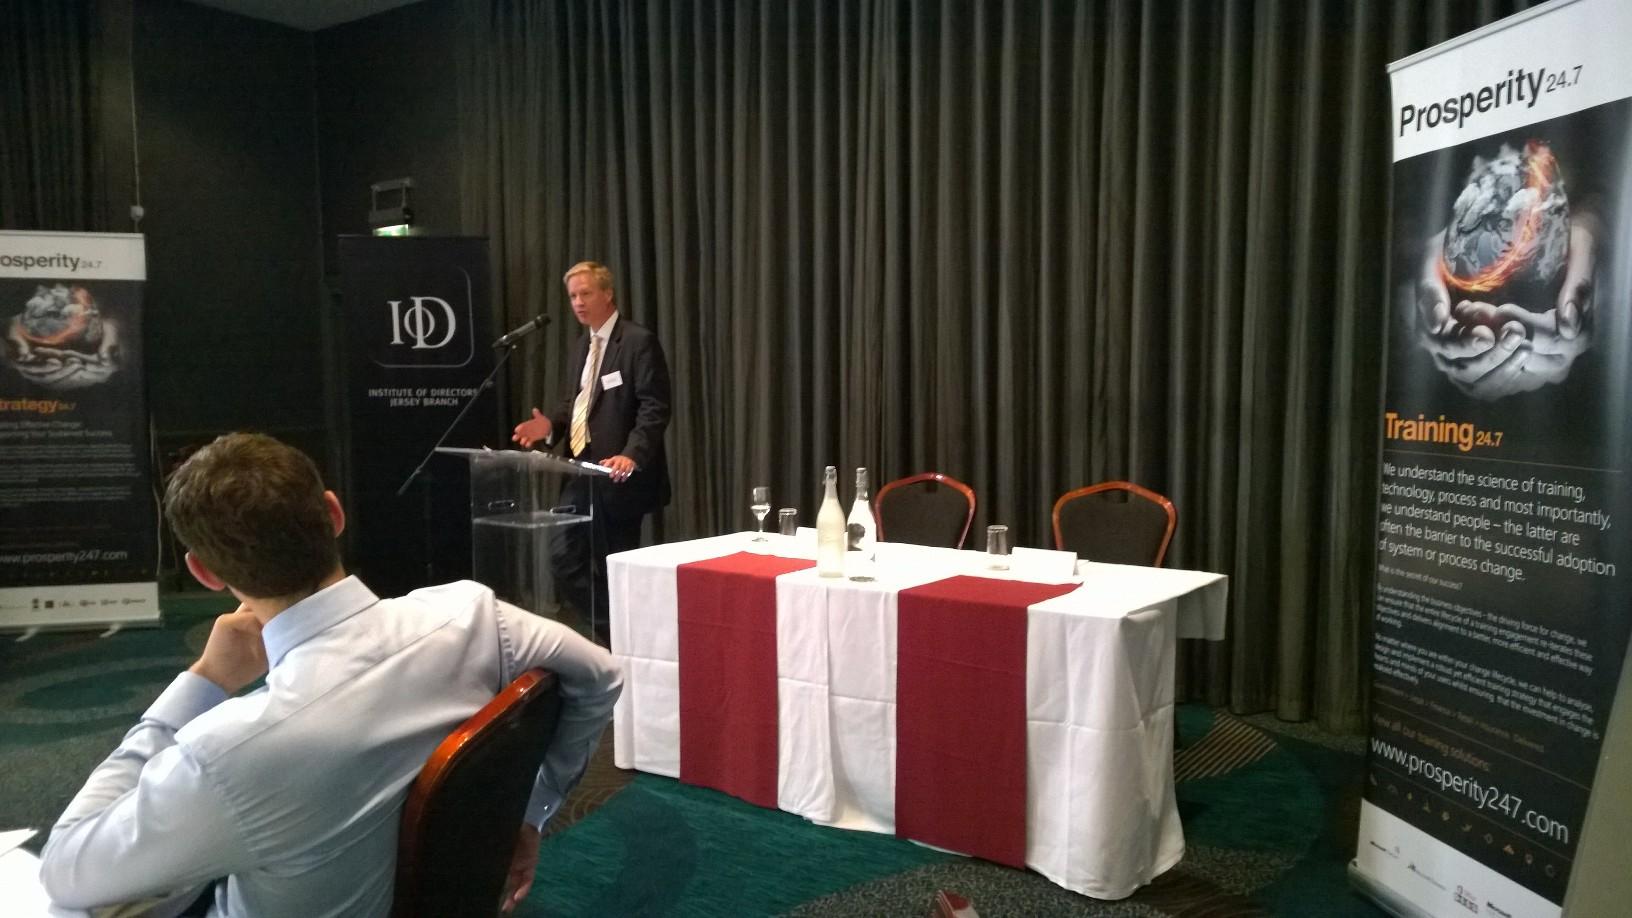 IoD Jersey Prosperity 247 Doug Bannister